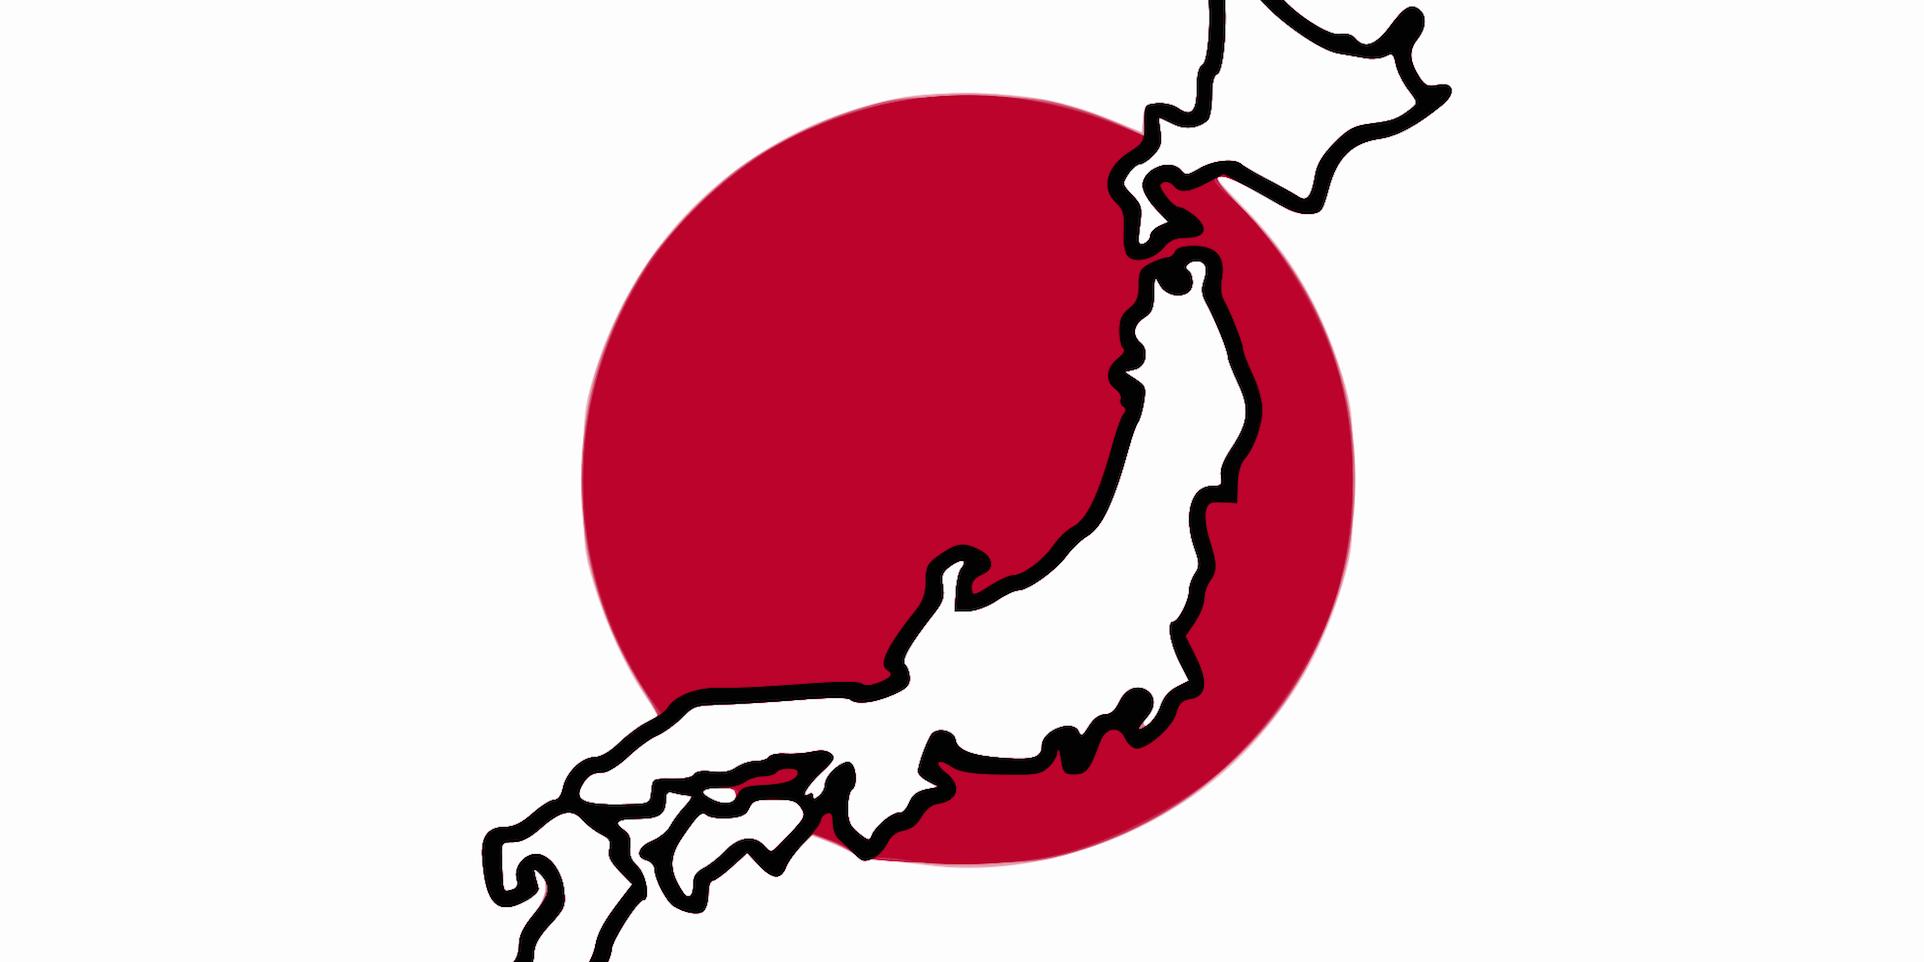 1924x962 Japan's Phillips Curve Looks Like Japan 1st Class Economics